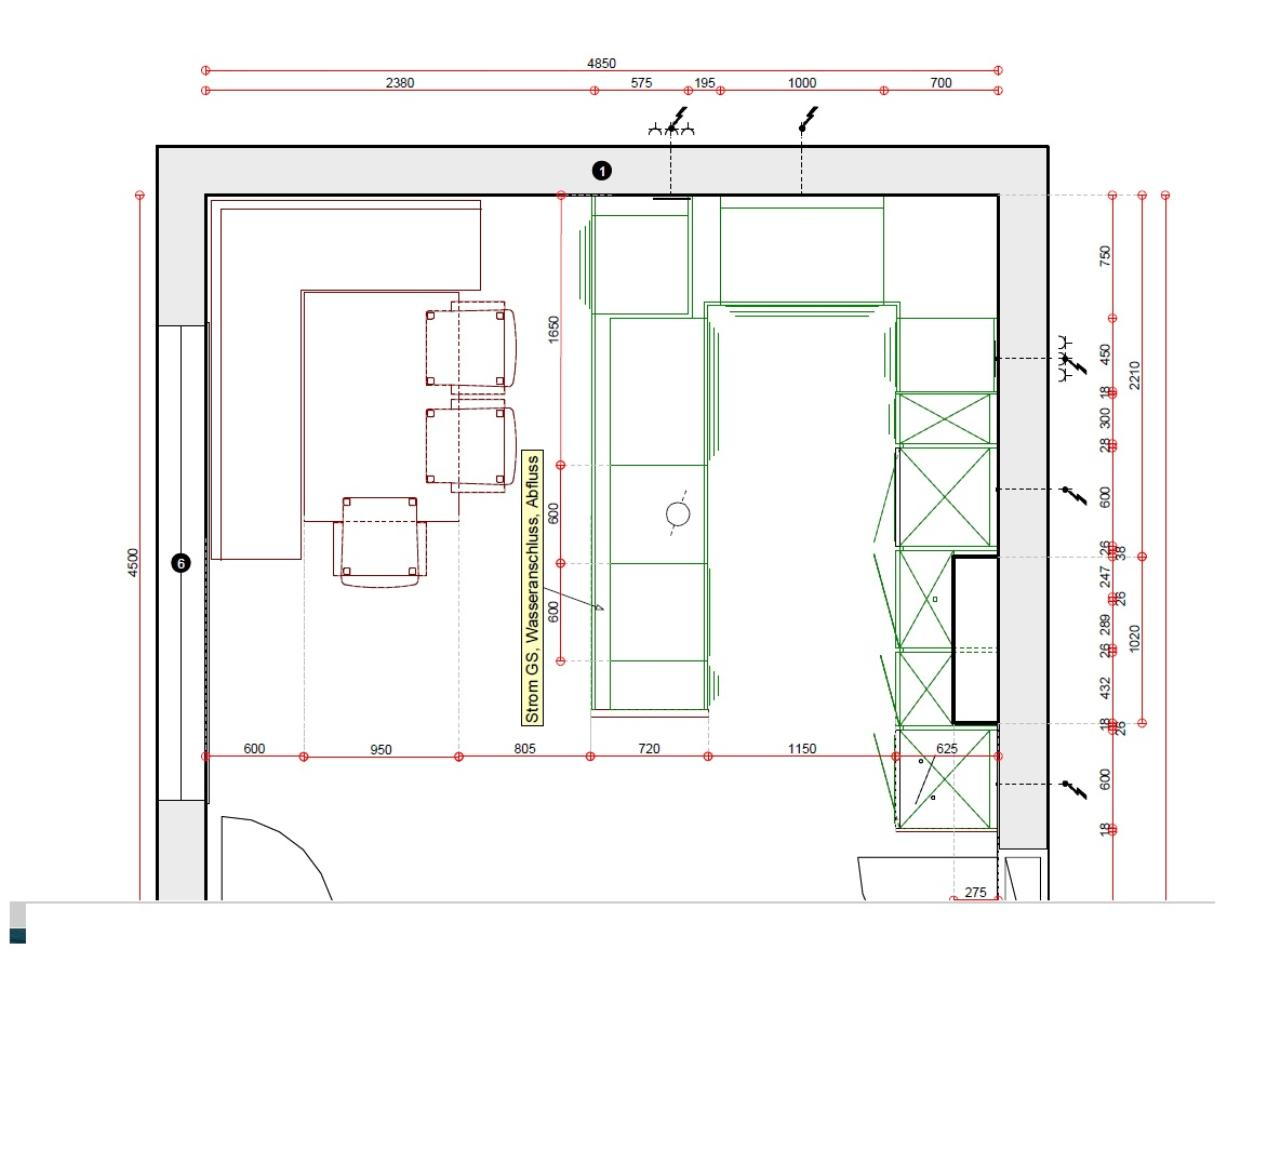 k che le mans ma e k che wei und eiche spritzschutz glas individuell ikea pimpen m lleimer. Black Bedroom Furniture Sets. Home Design Ideas